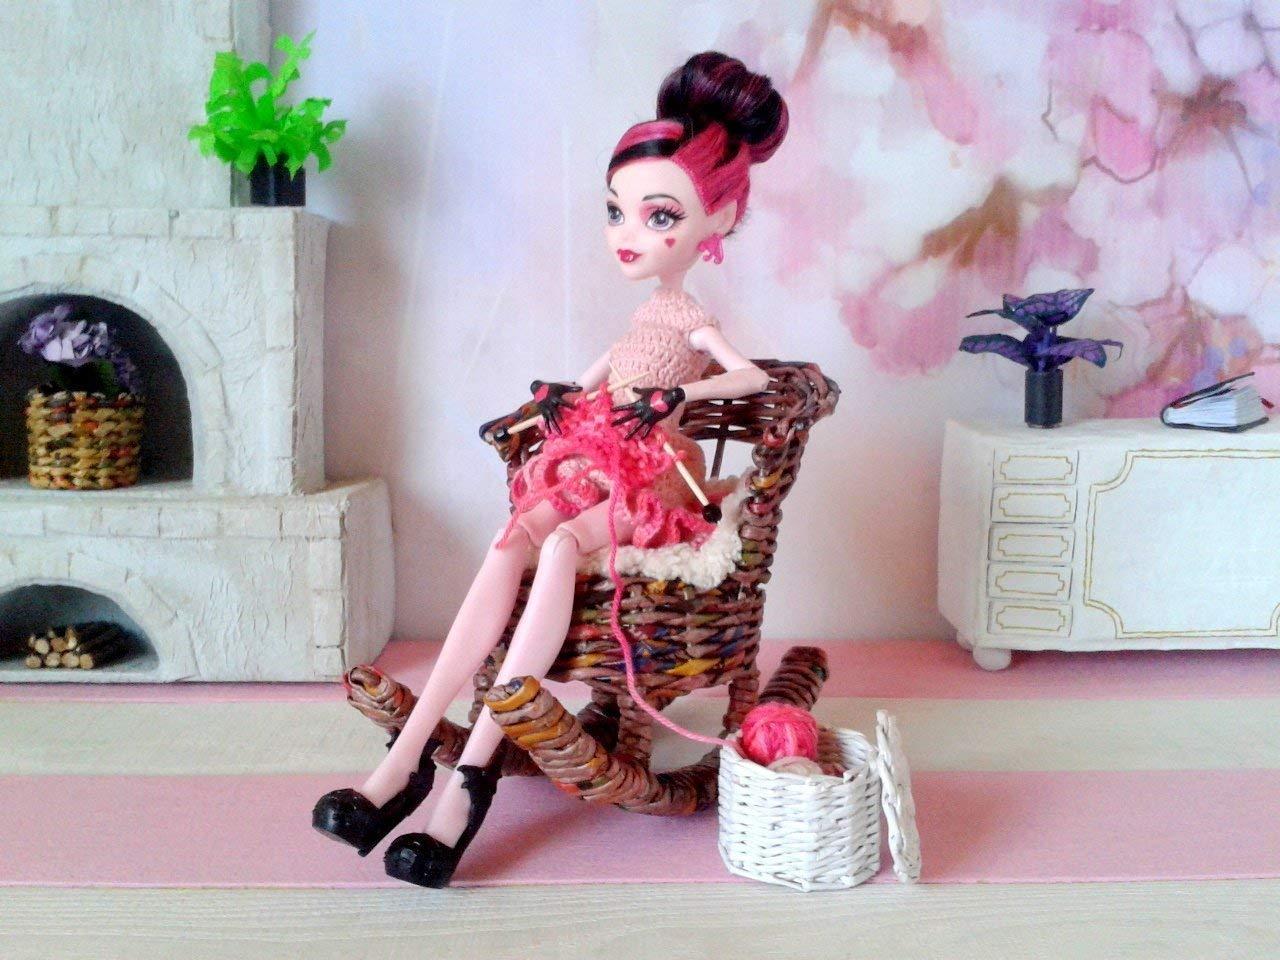 Momoko Medium Green Doll Stockings for 1//6 Scale figures Dollfie MSD BJD Phicen Triad Hot Toys Obitsu Gildebrief